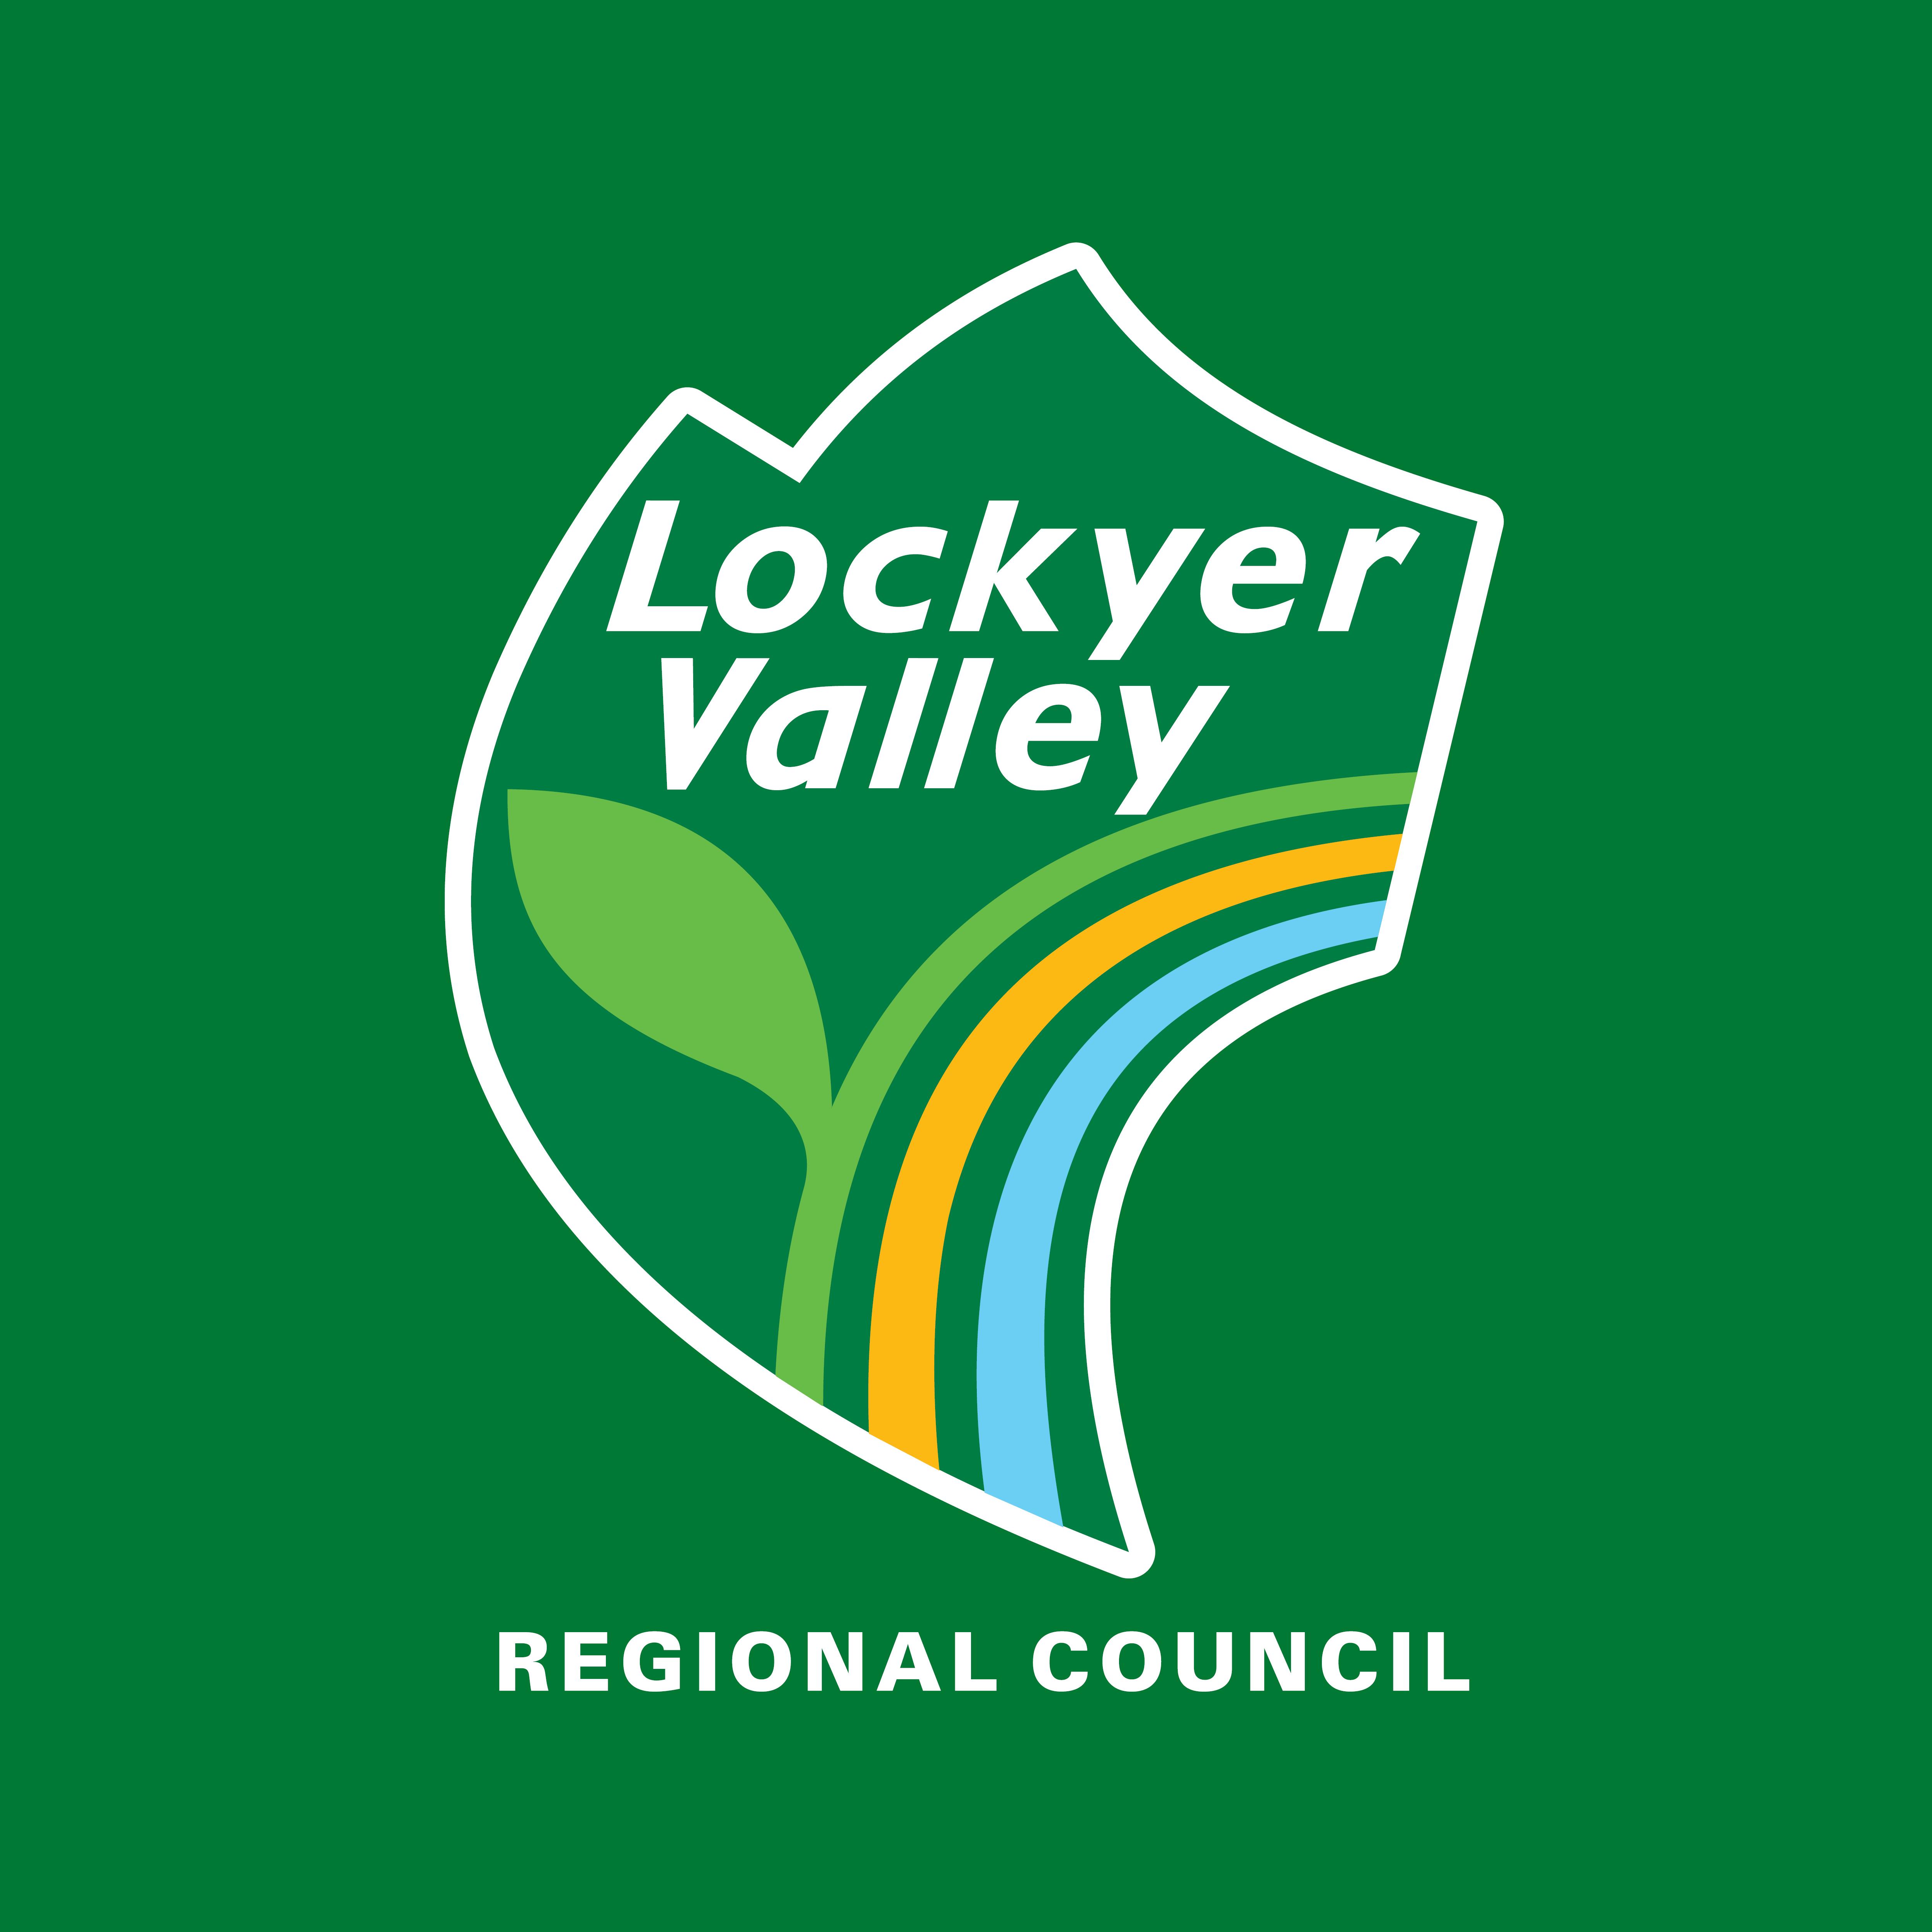 Lockyer Valley Council